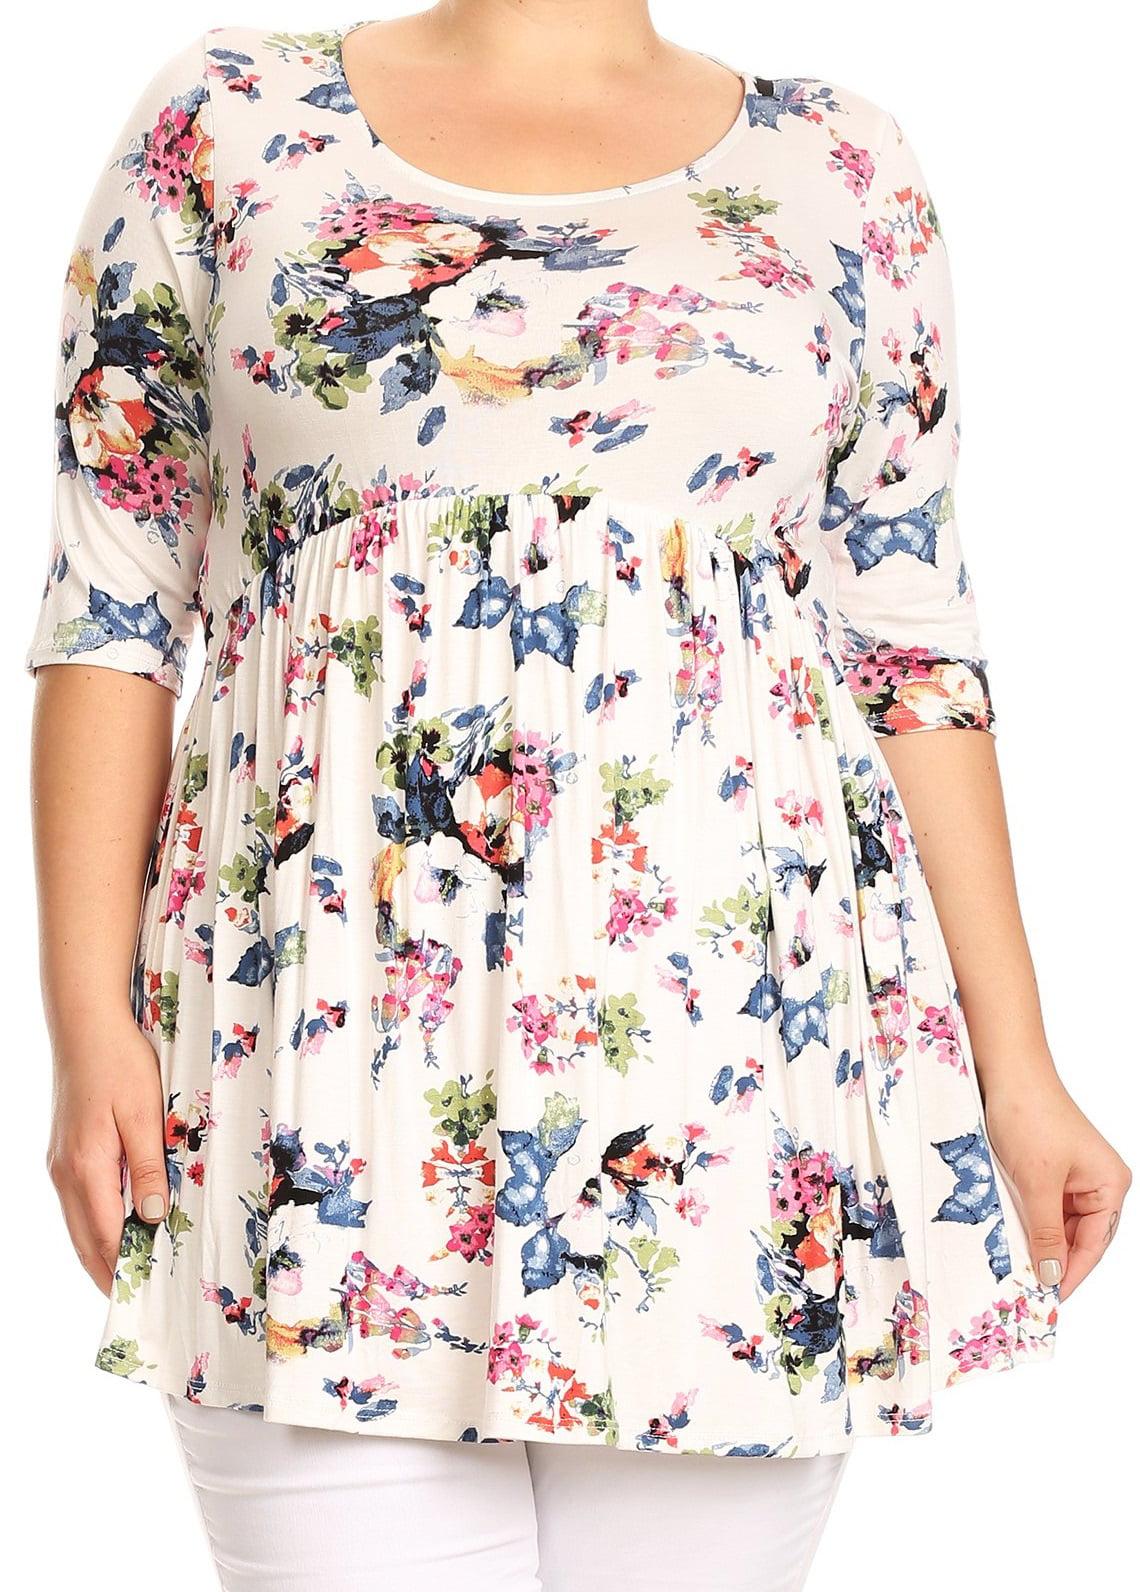 Women Plus Size Short Sleeve Rose Pattern Print Tunic Knit Top Tee White XL B492